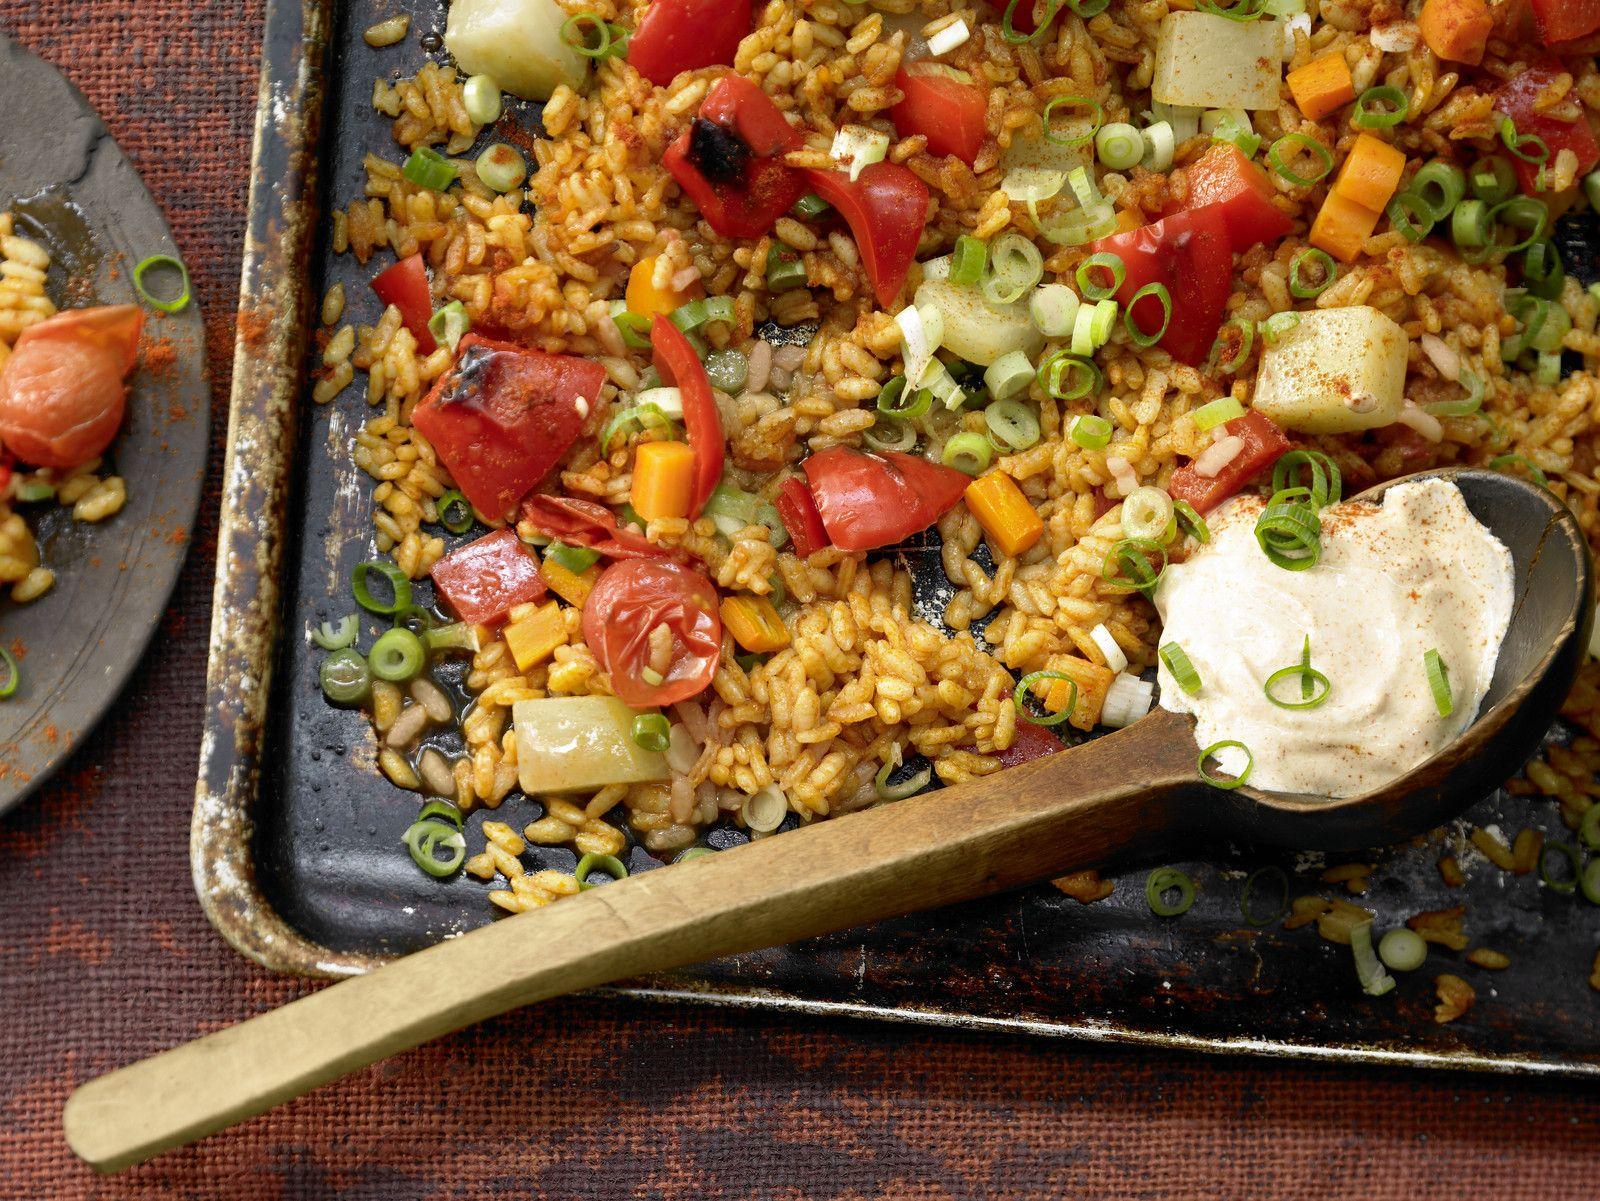 Gemüse-Reis-Pfanne aus dem Ofen Rezept | EAT SMARTER